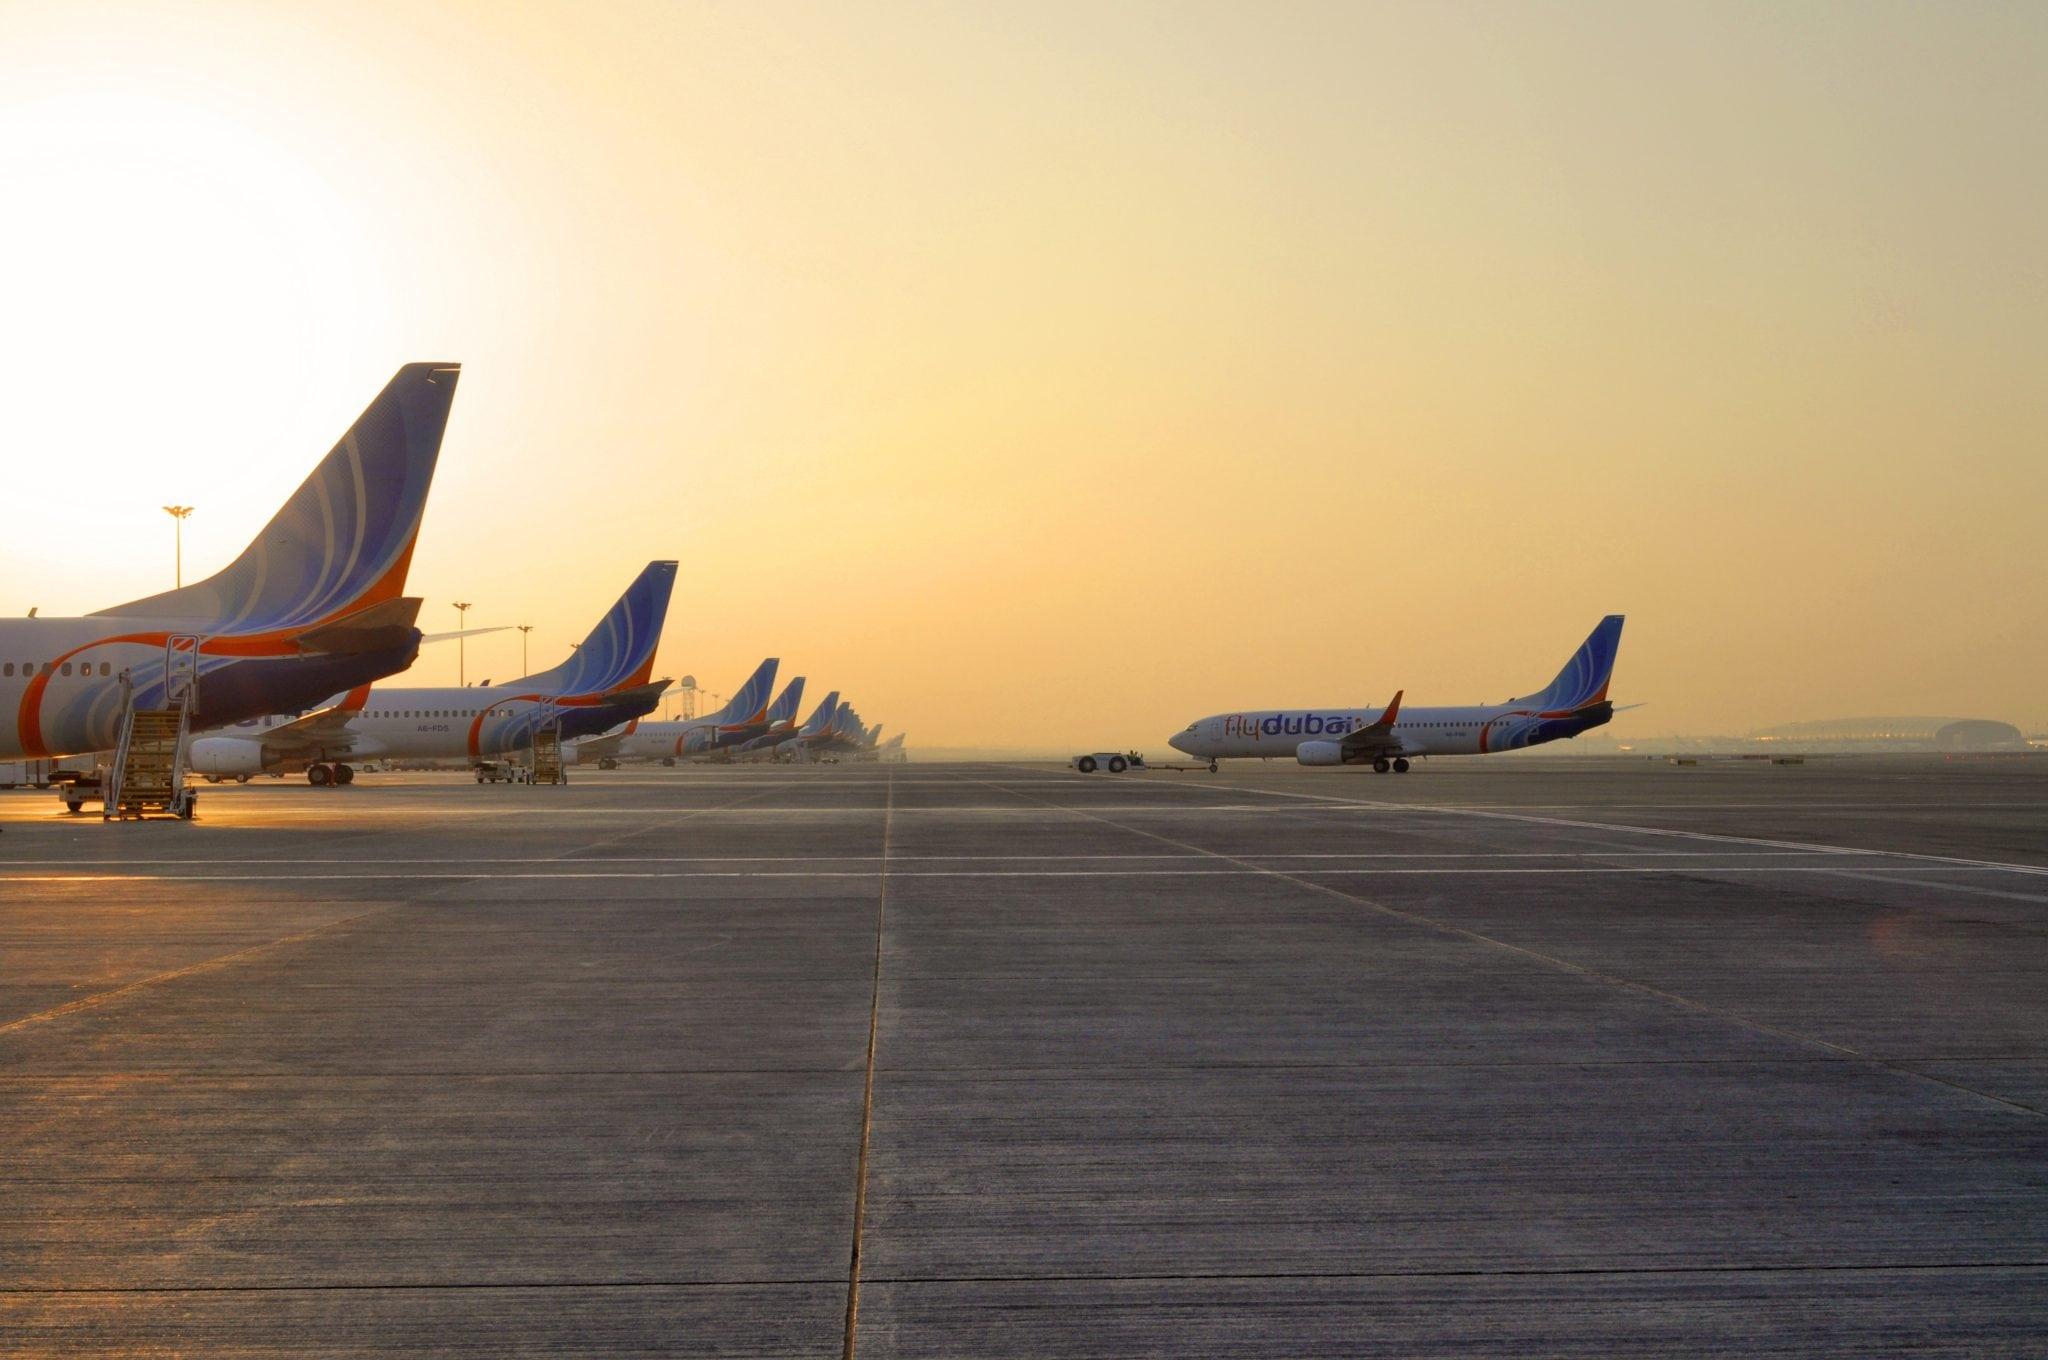 Terminal 2 Ramp at Dubai International Airport